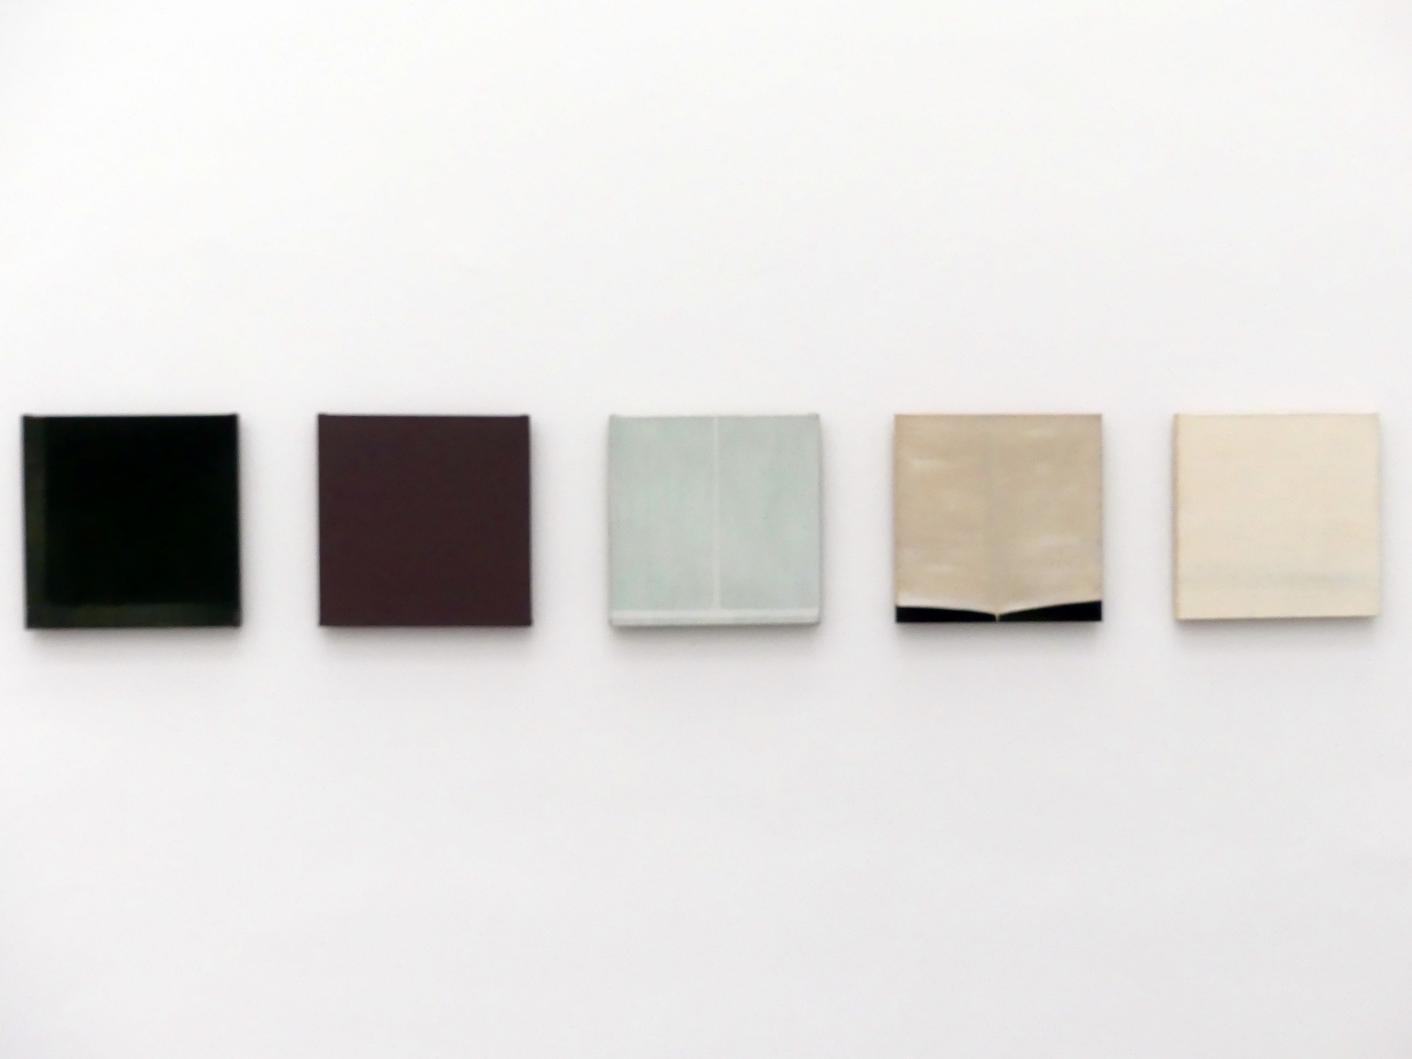 Raoul De Keyser: Notebook III, 1973